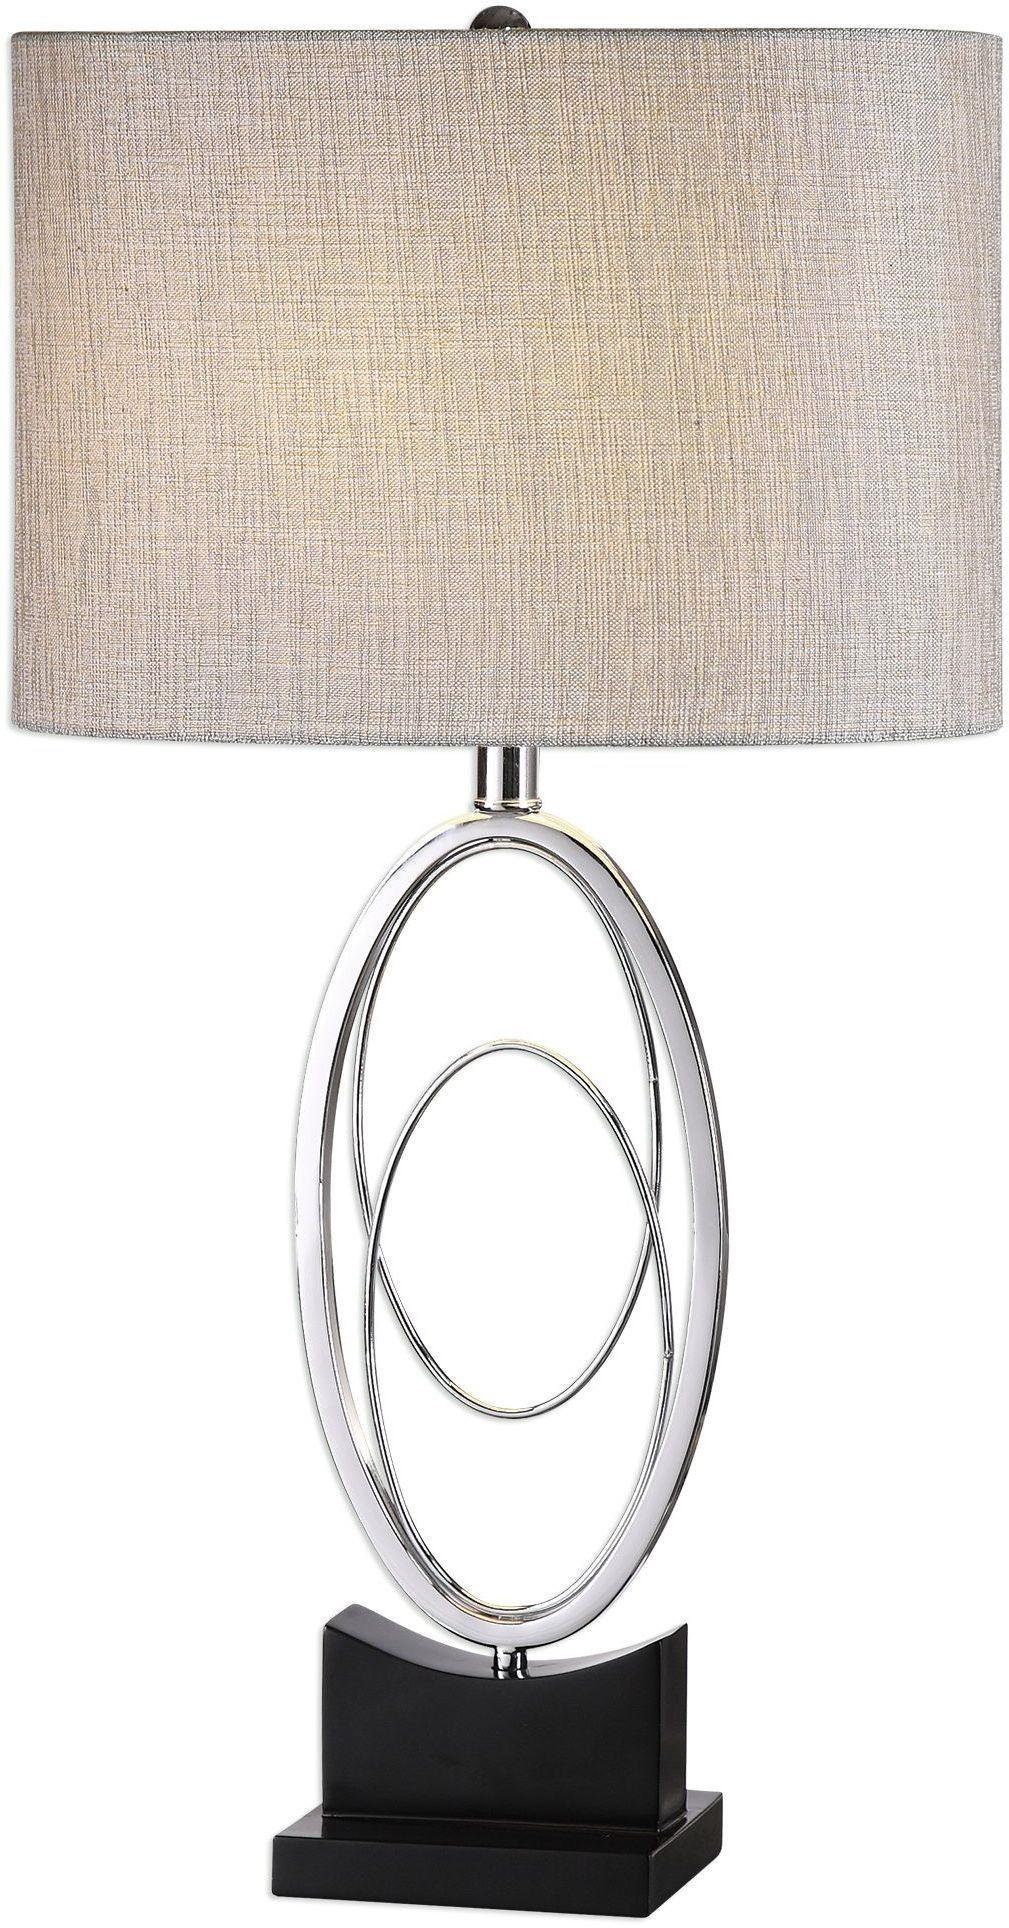 Savant Polished Nickel Table Lamp 27532 1 Uttermost